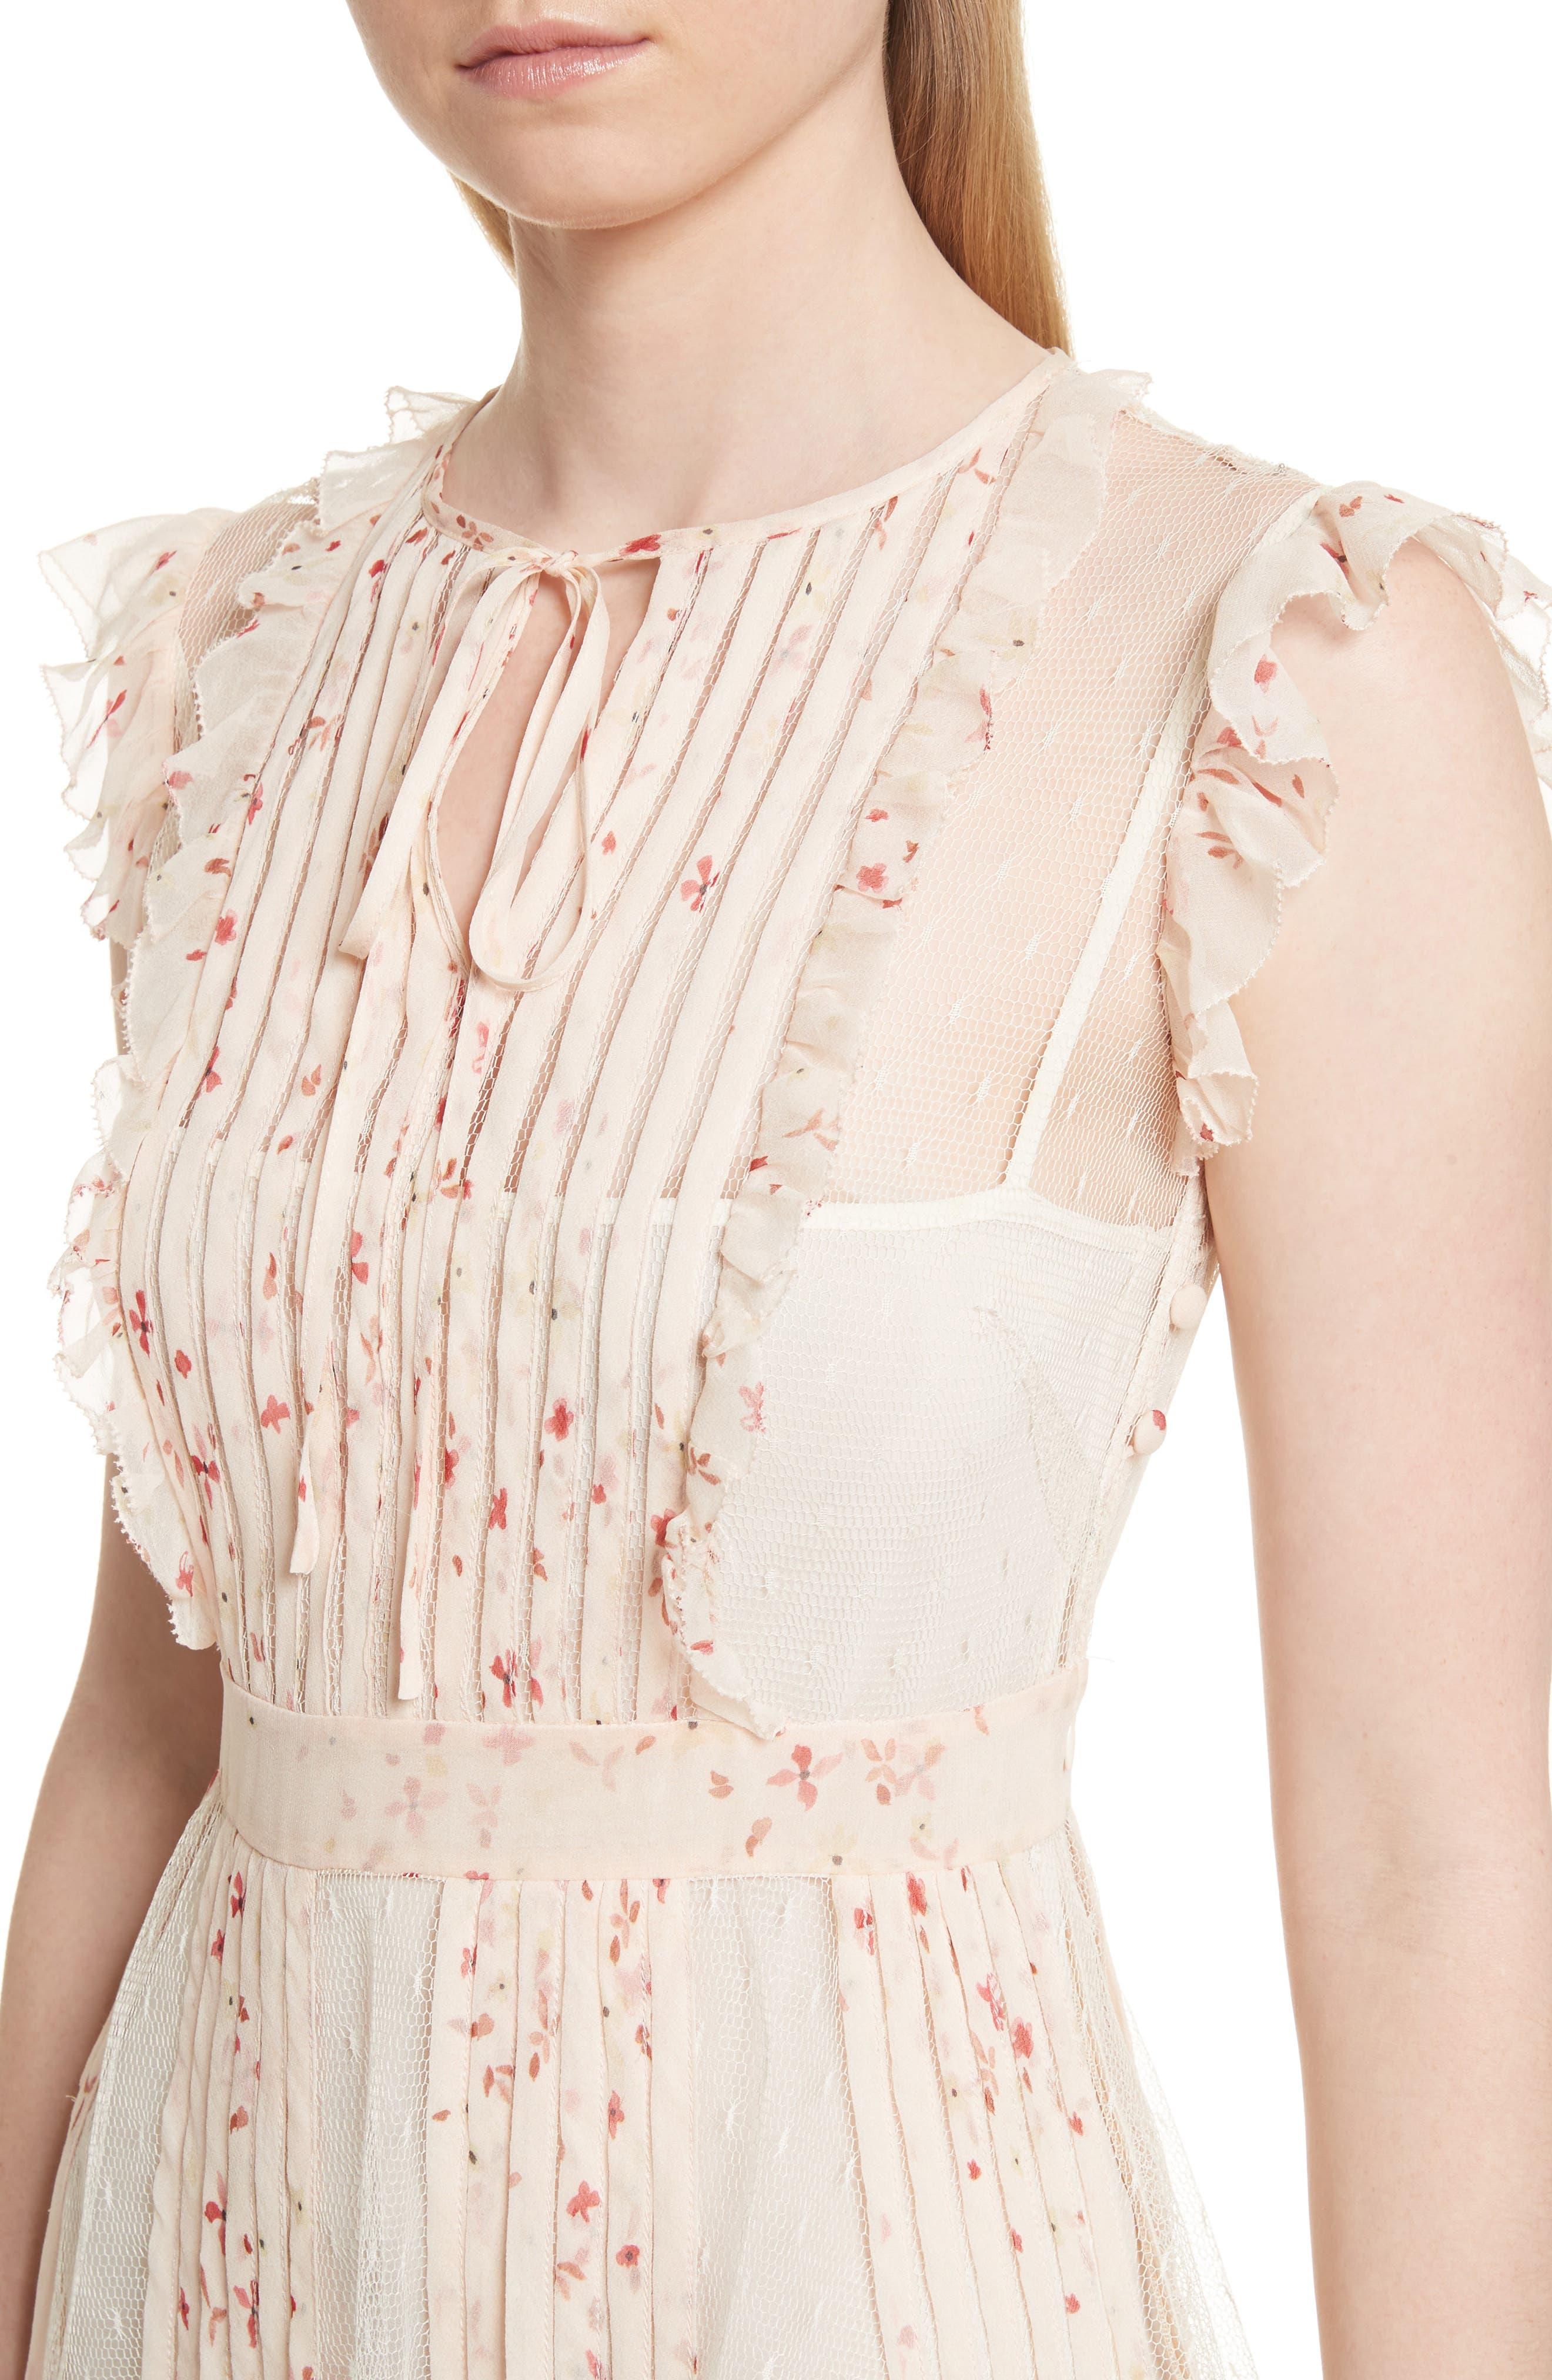 Point dEsprit Ruffle Trim Dress,                             Alternate thumbnail 4, color,                             Ivory